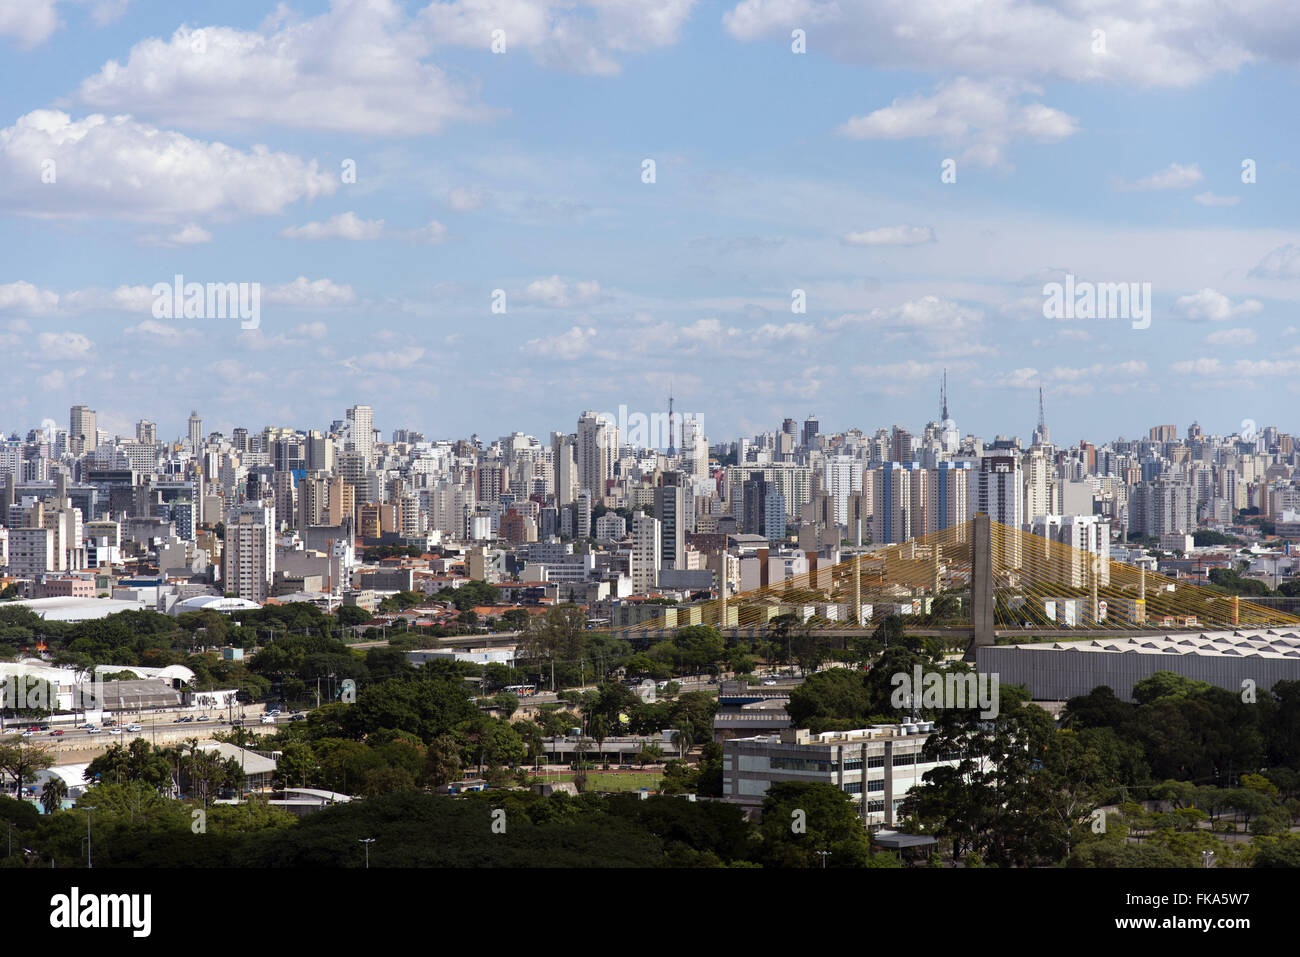 City center seen from the Champ de Mars and cable-stayed bridge Govenrador Orestes Quercia - Stock Image